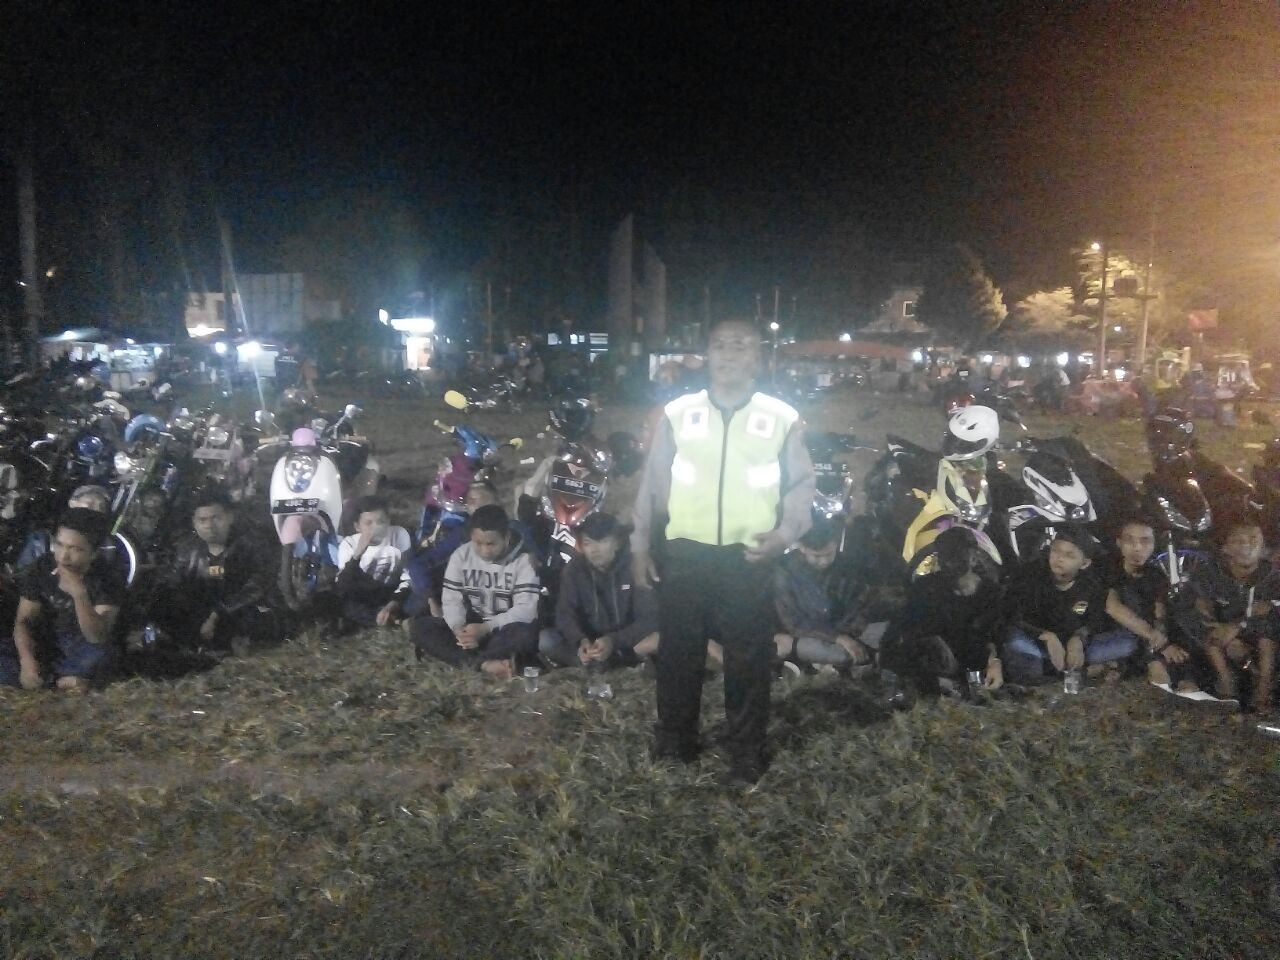 Bhabinkamtibmas Polsek Kroya Cilacap Rangkul Anggota Club Motor Jaga Kamtibmas